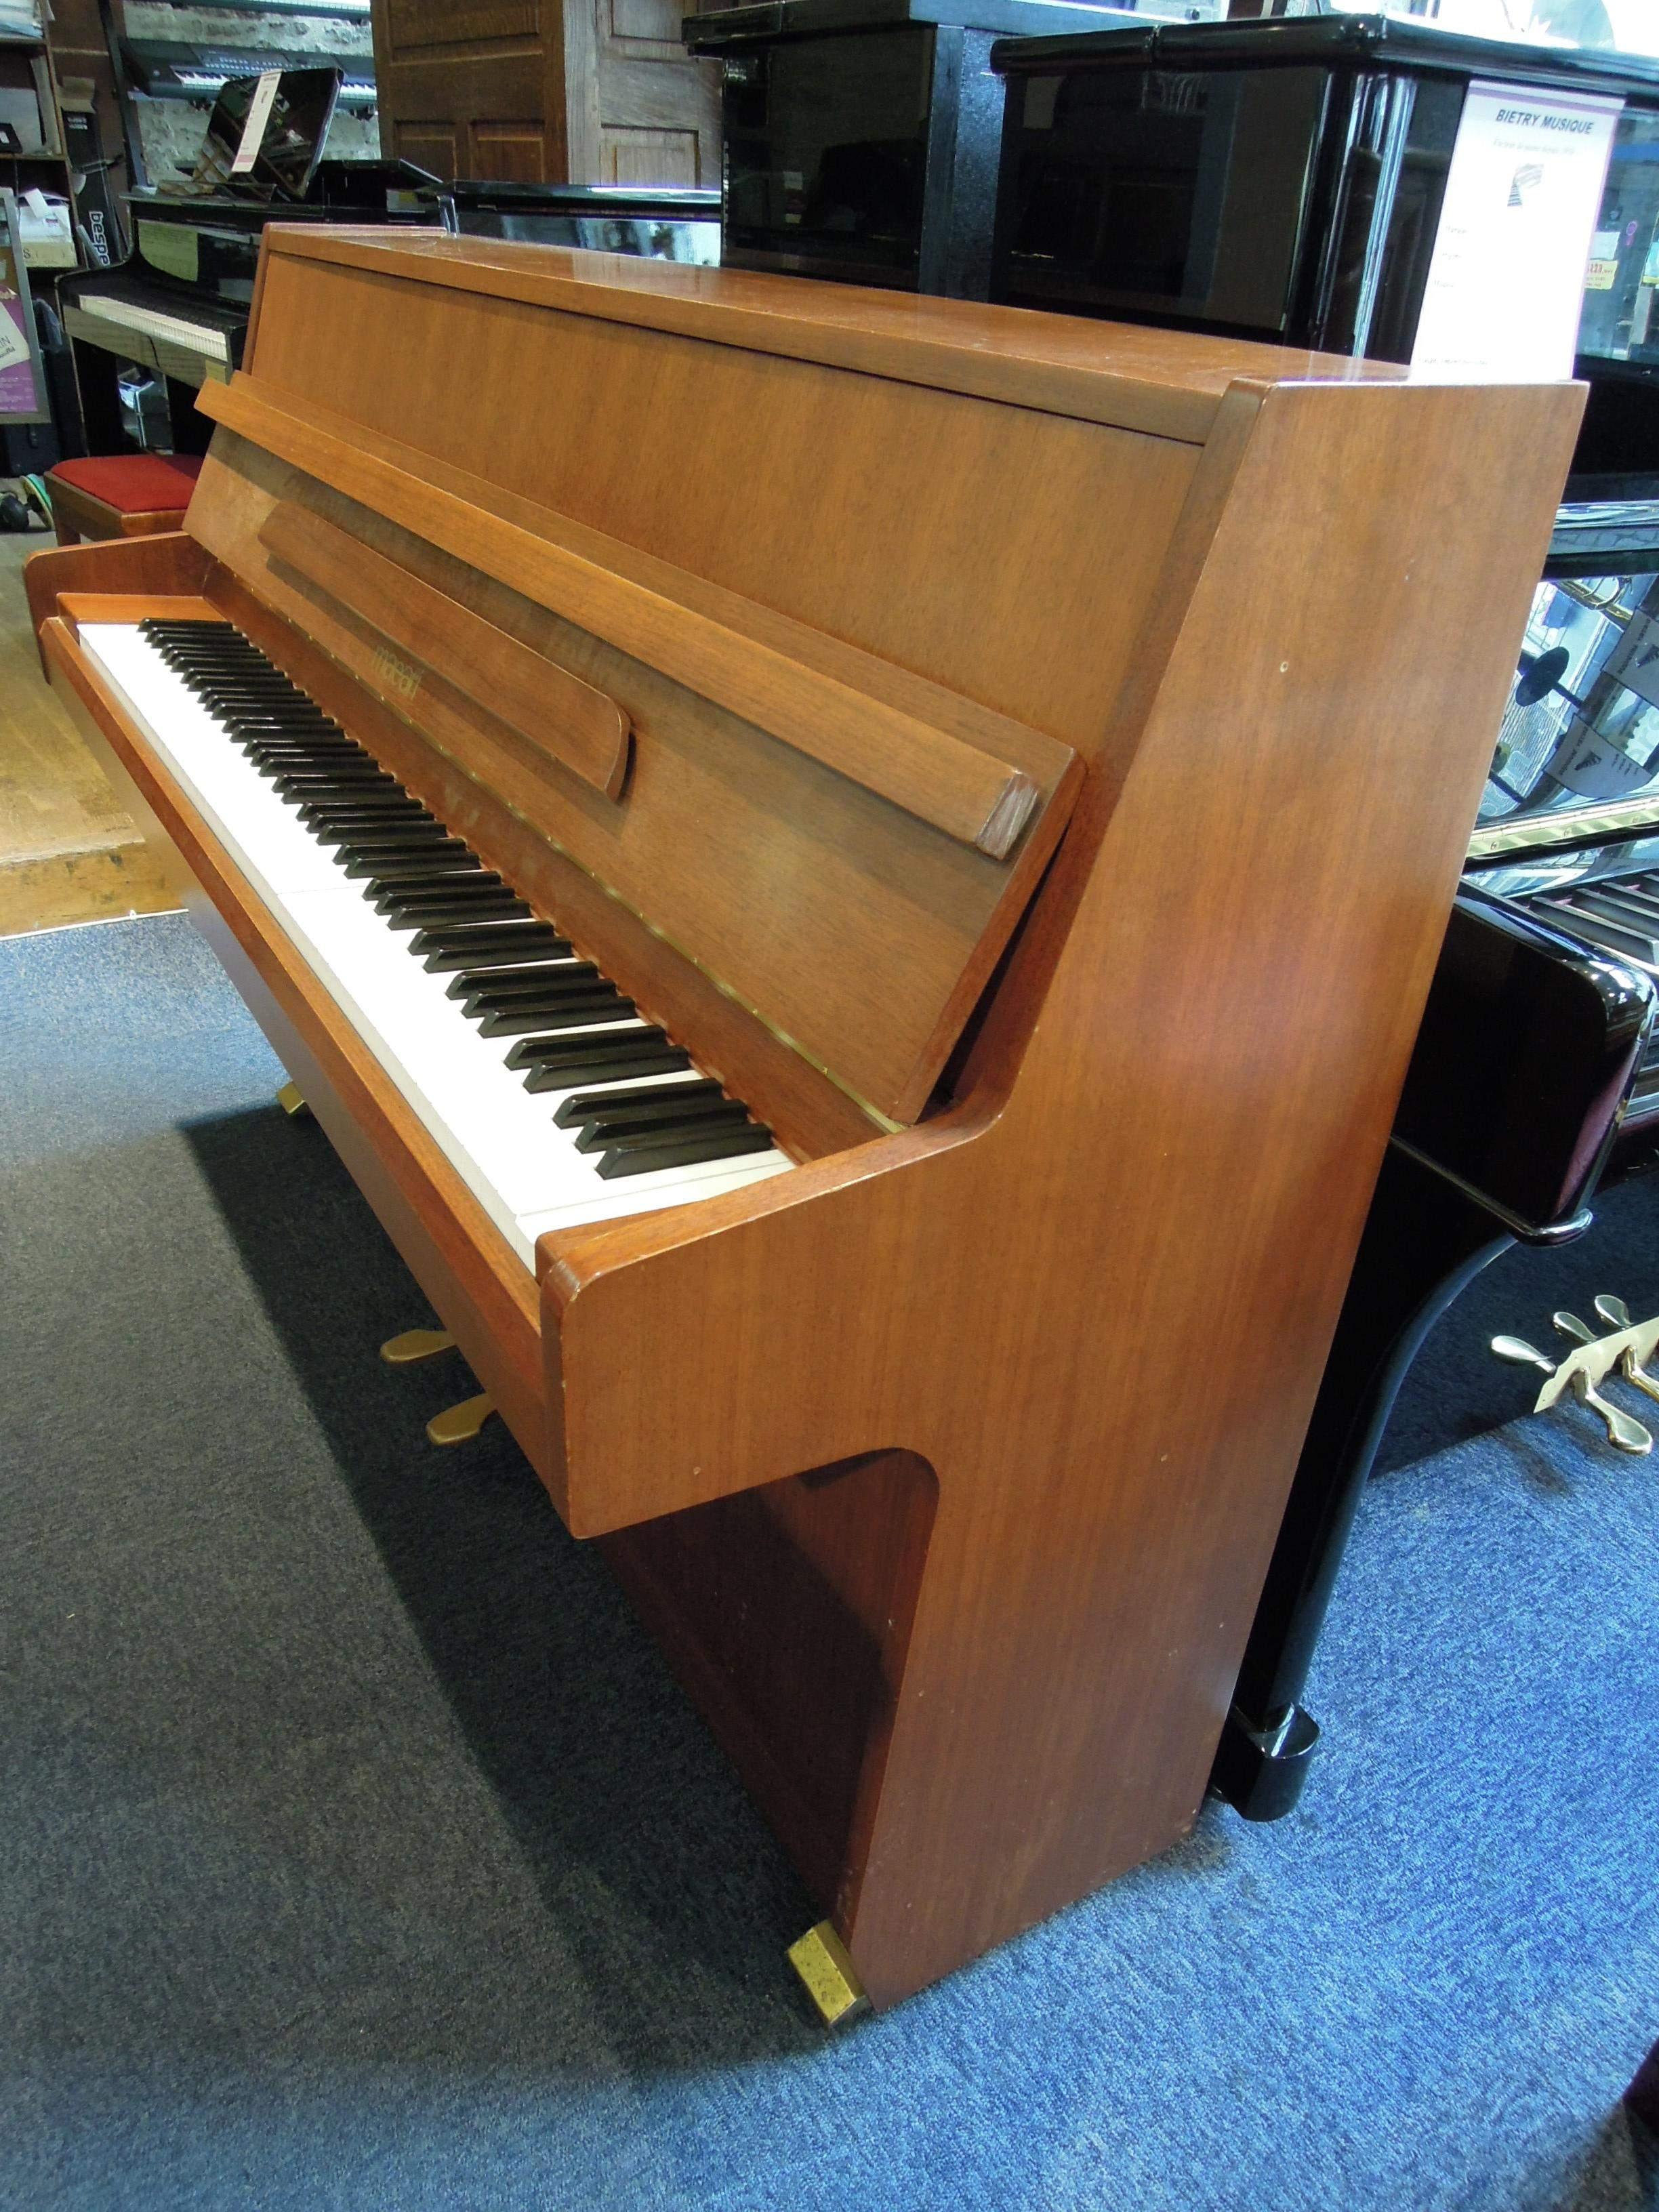 piano droit d 39 occasion maeari u822 bietry musique. Black Bedroom Furniture Sets. Home Design Ideas